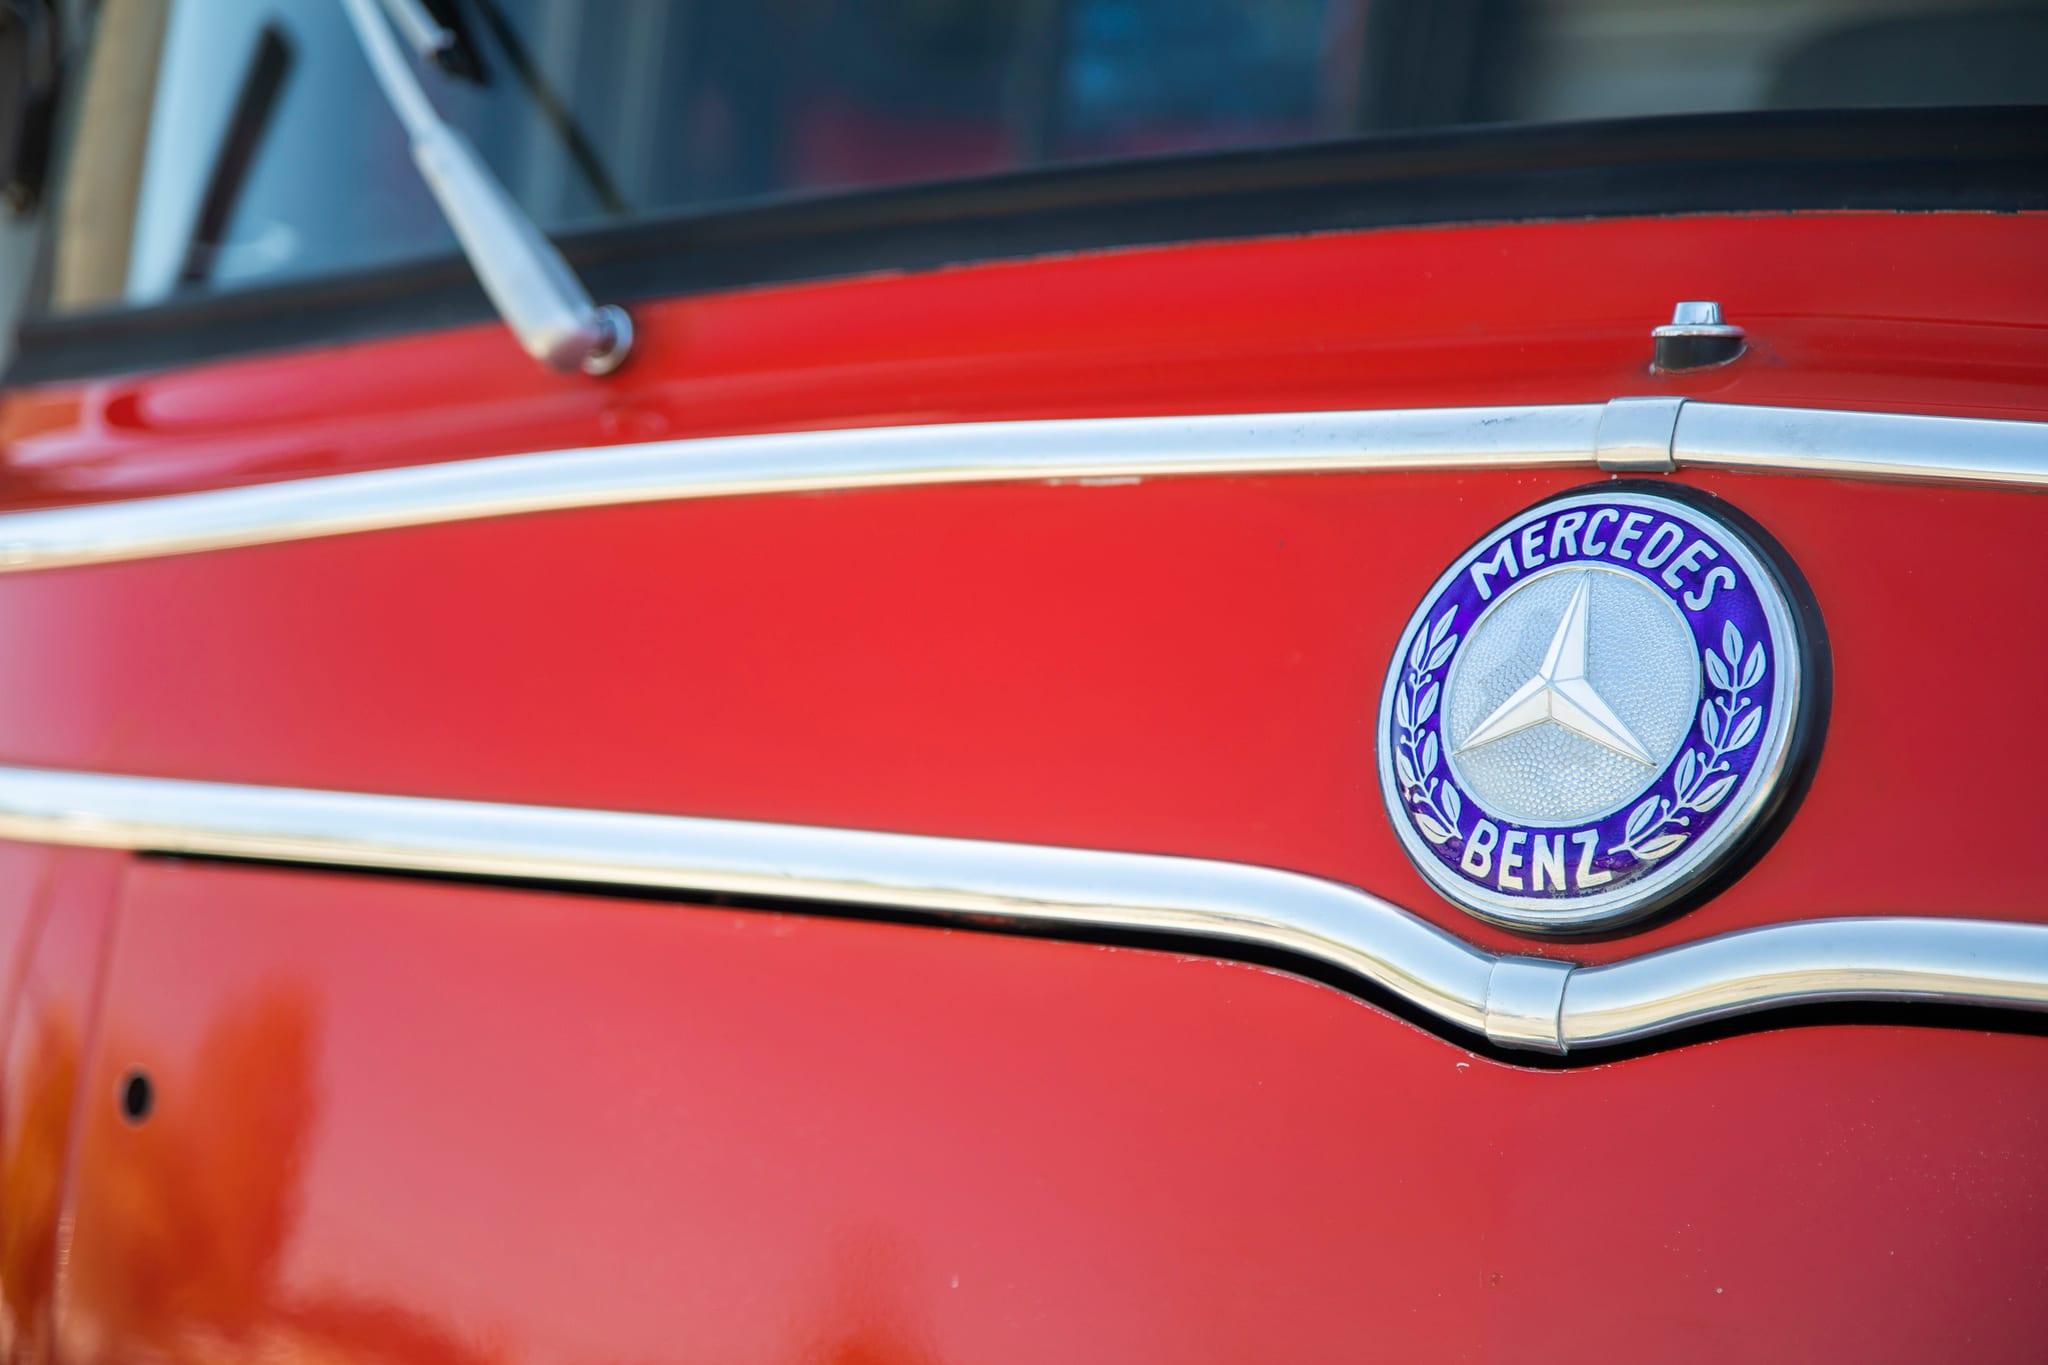 1965_mercedes-benz_lt-8_l319_firetruck